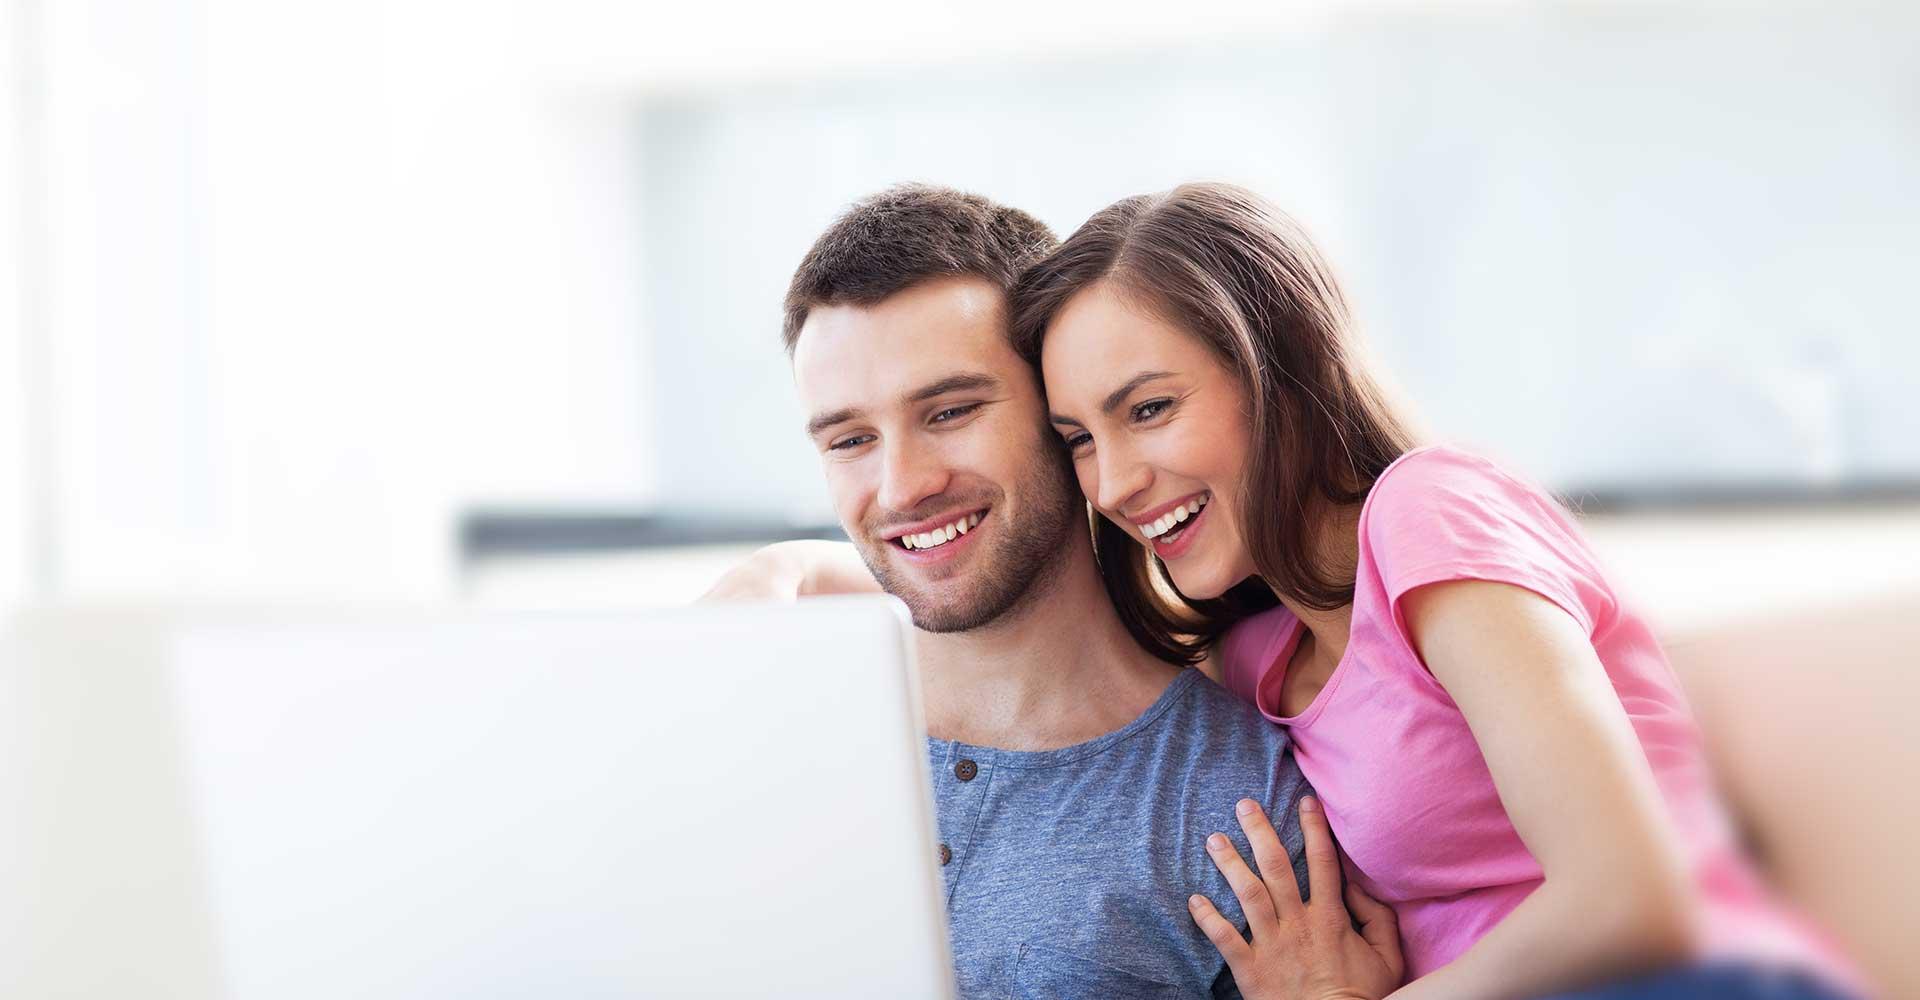 gratis dating sites Kings Lynn